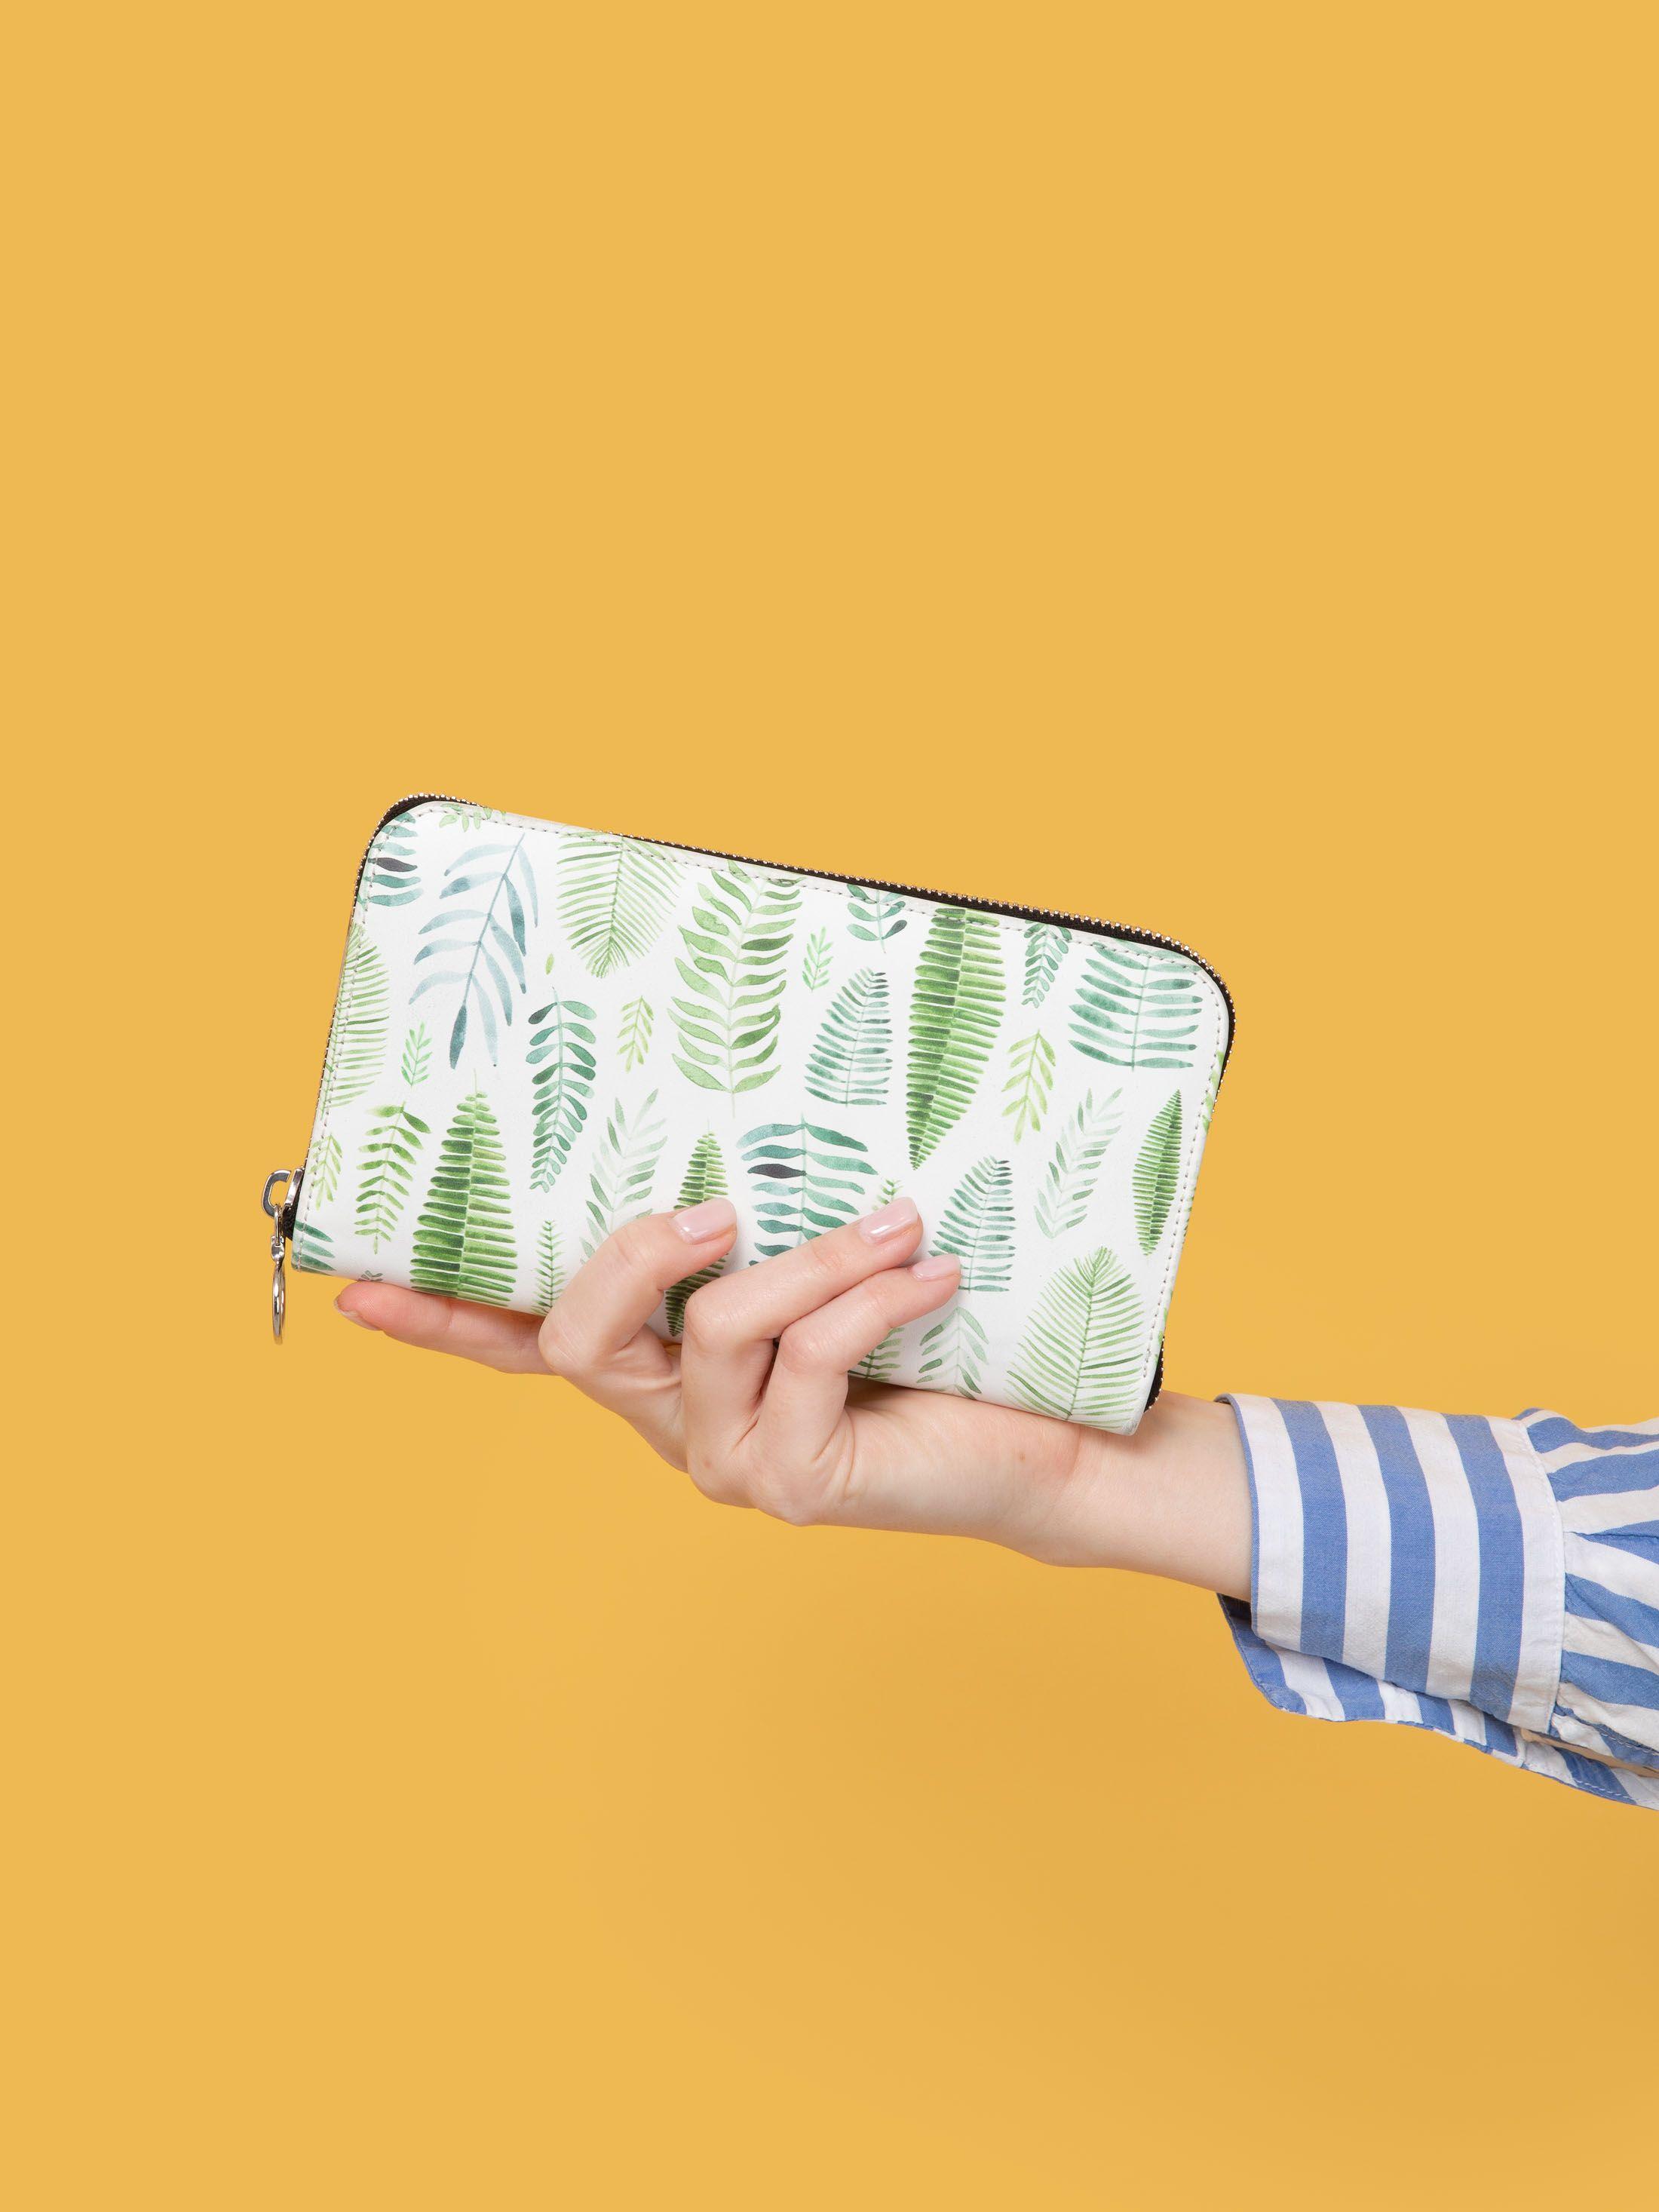 custom leather long wallets